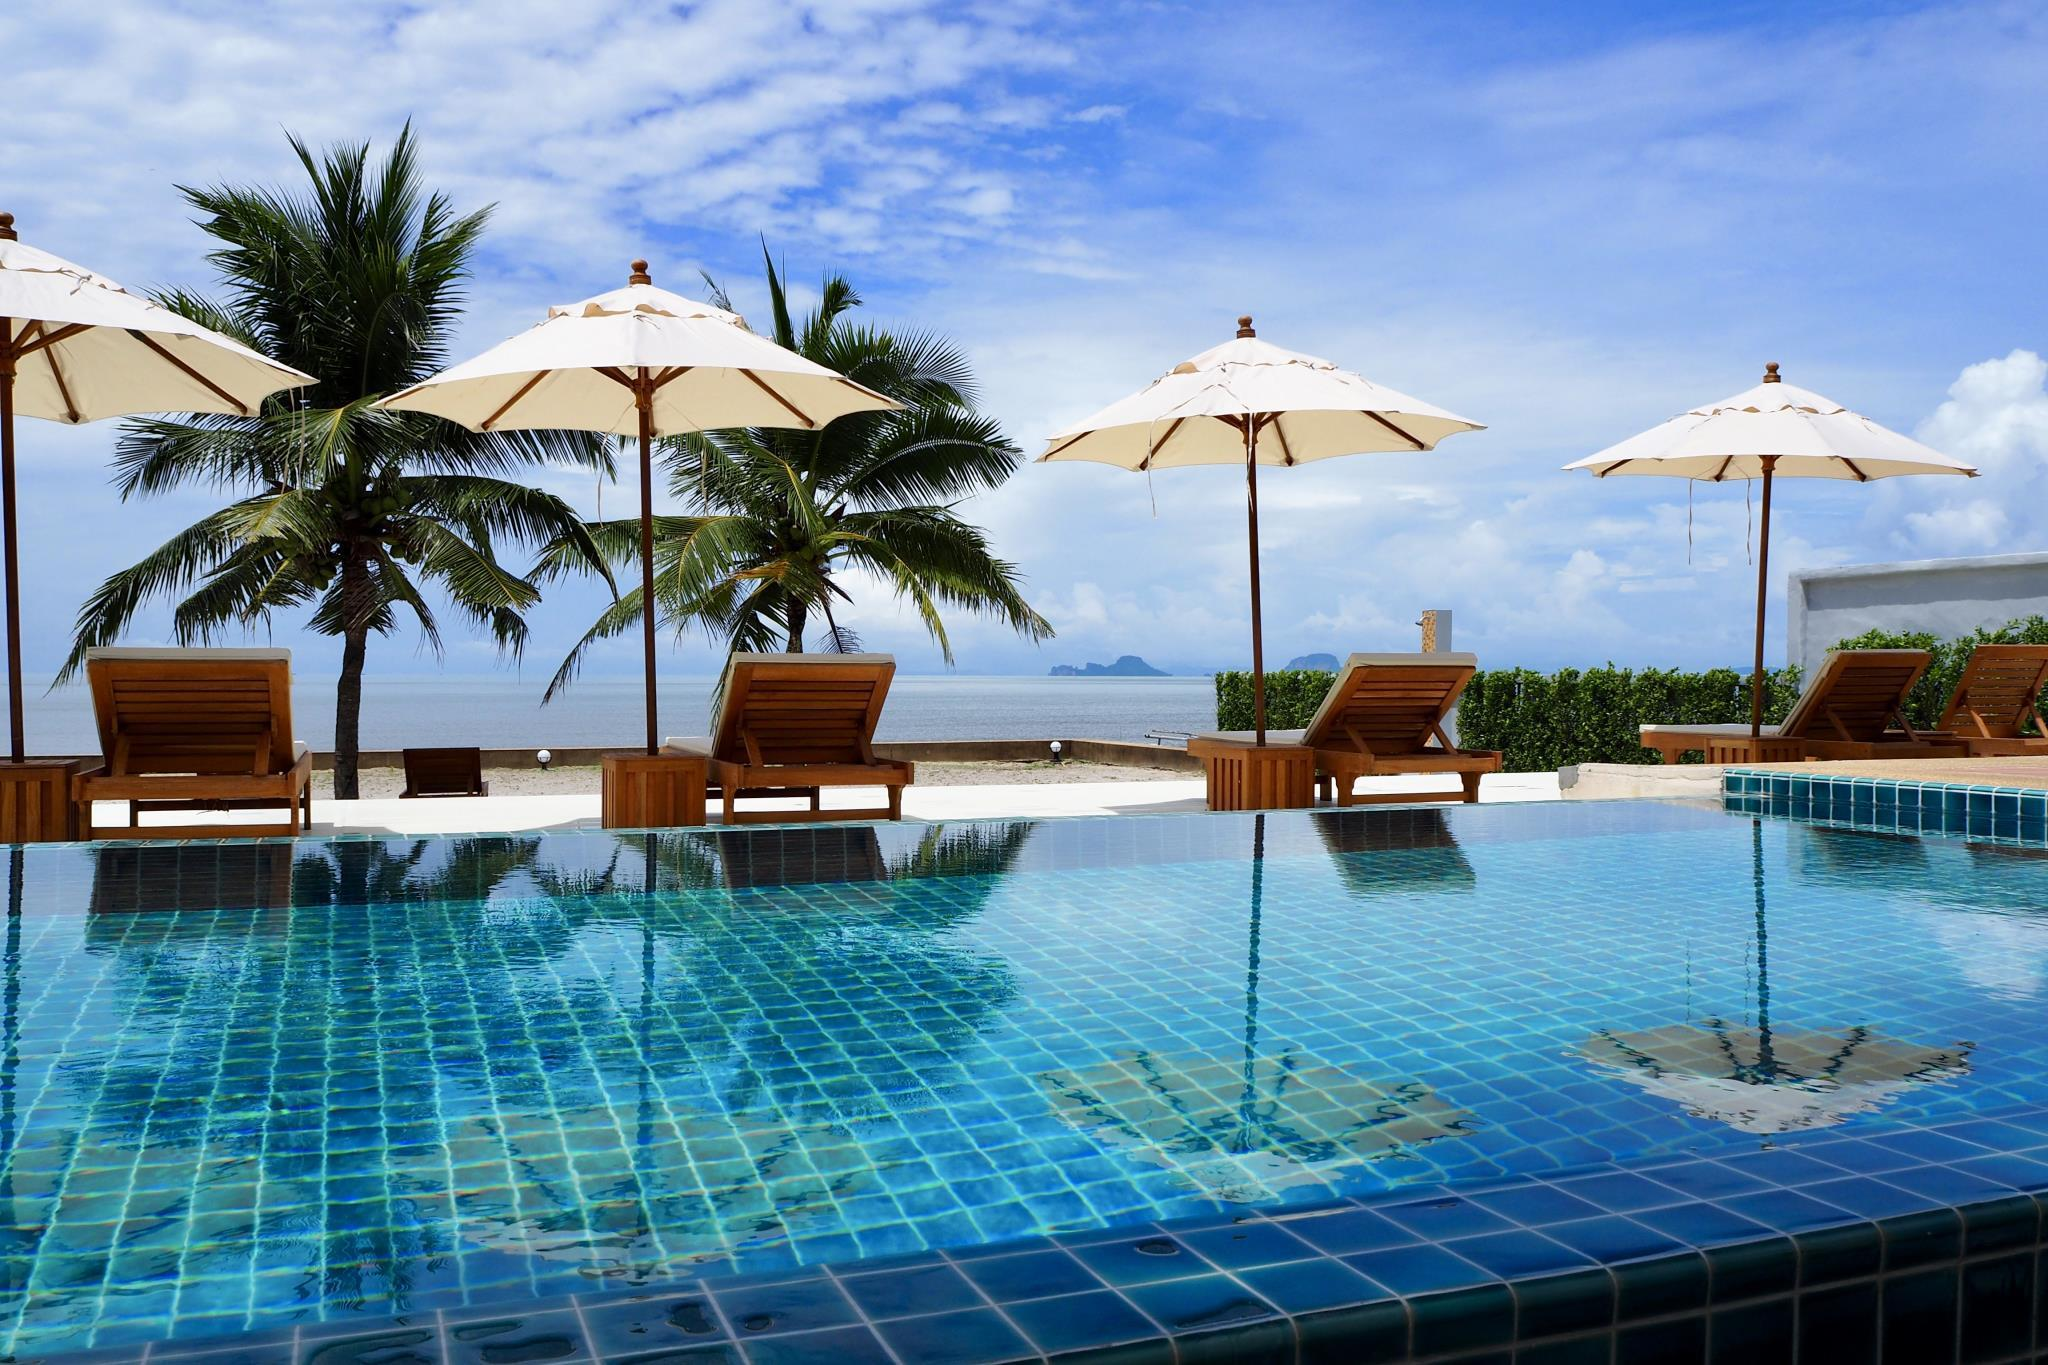 Purin Resort & Restaurant Purin Resort & Restaurant